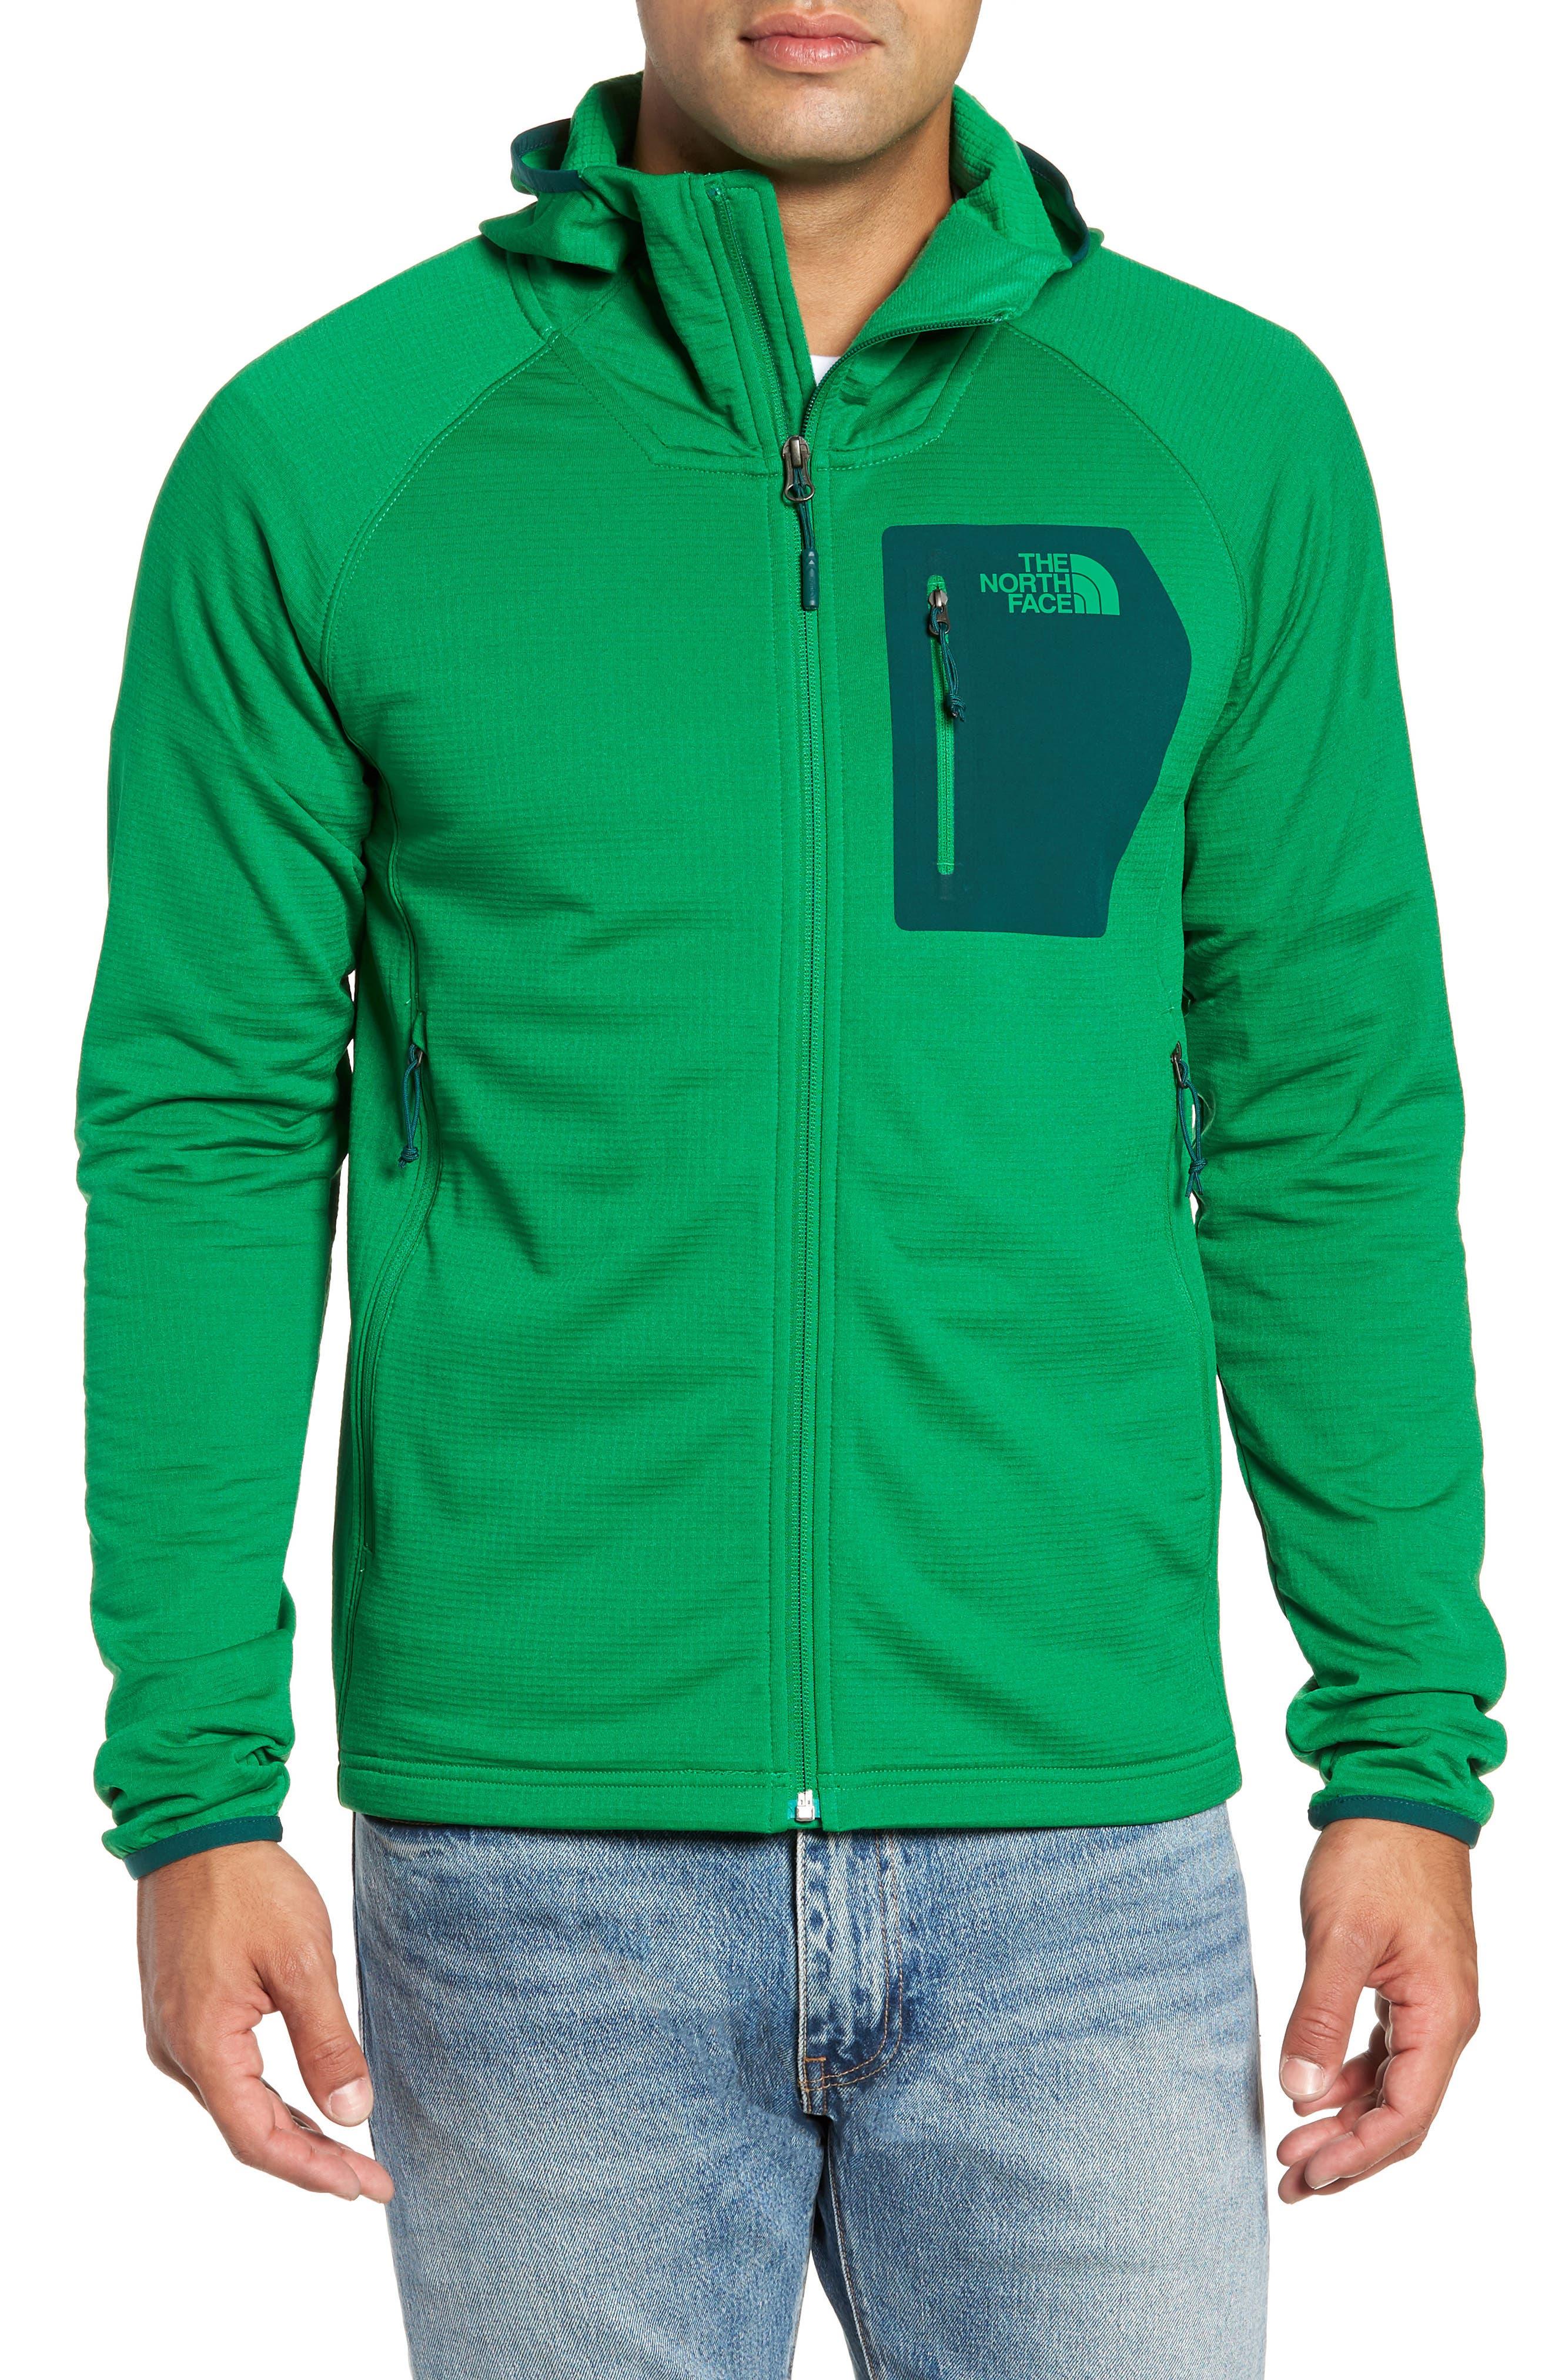 Borod Zip Fleece Jacket,                             Alternate thumbnail 4, color,                             PRIMARY GREEN/GARDEN GREEN